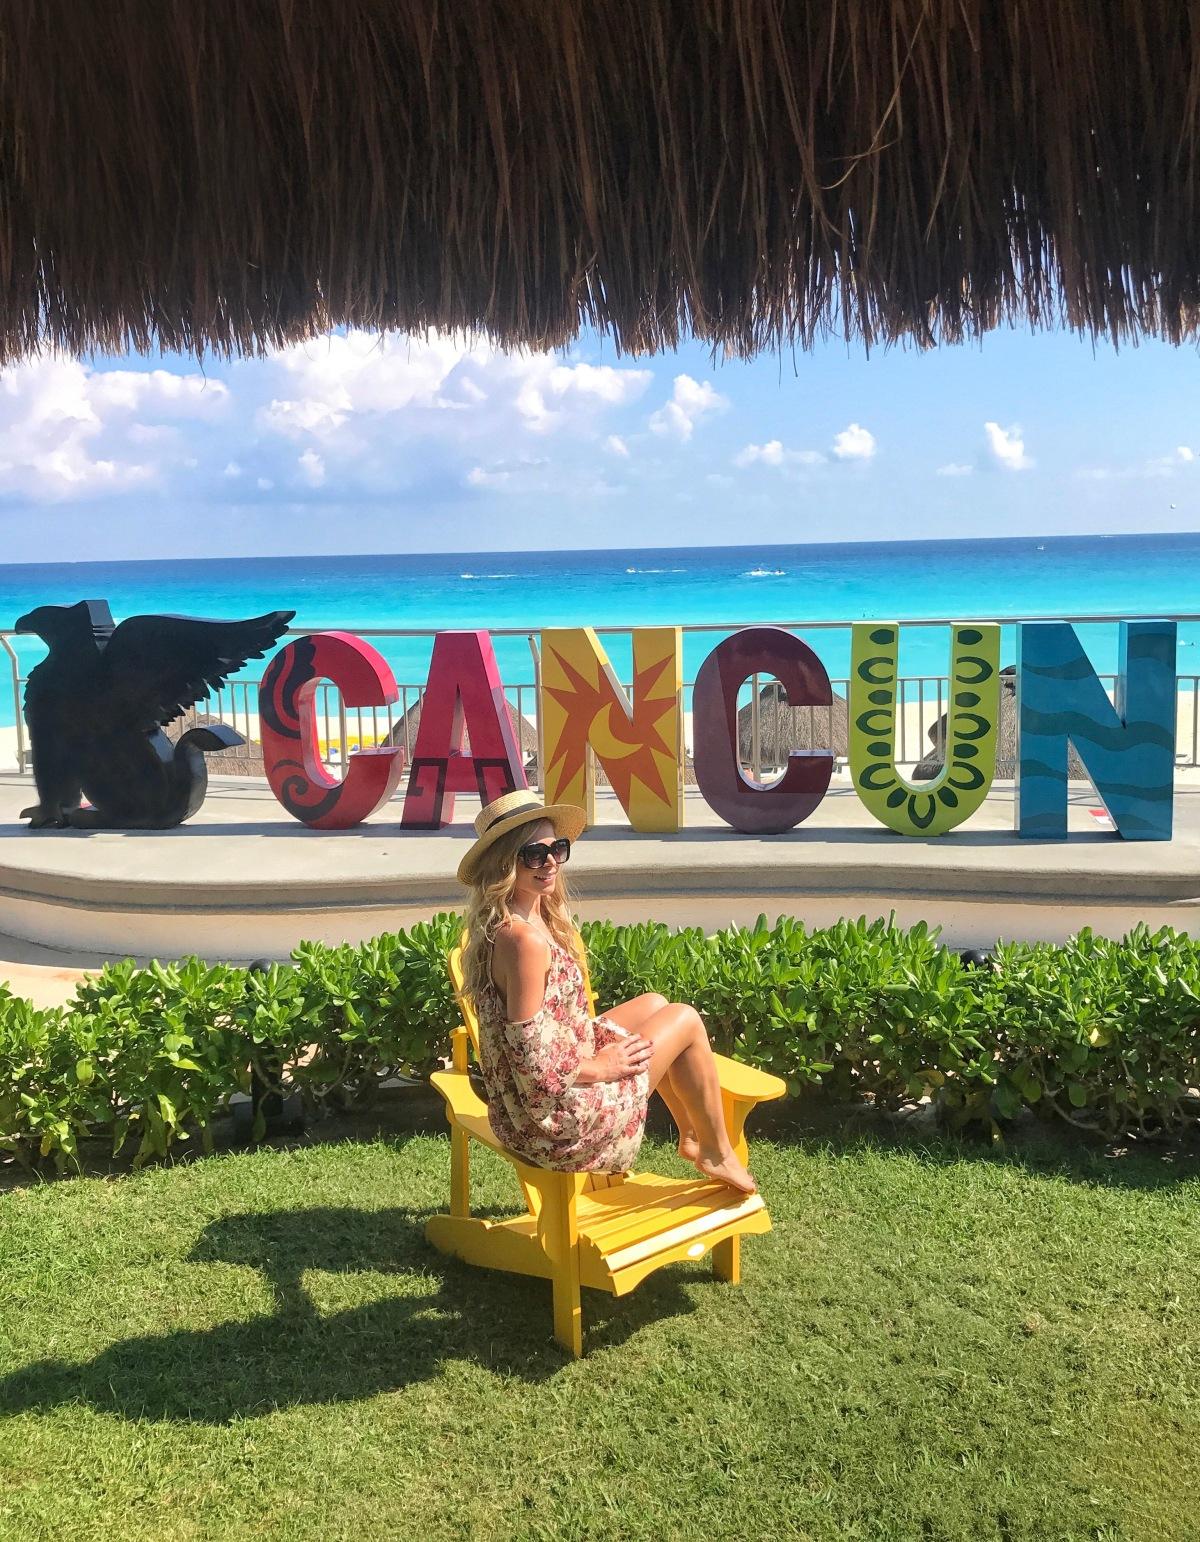 JW Marriott Cancun,Mexico